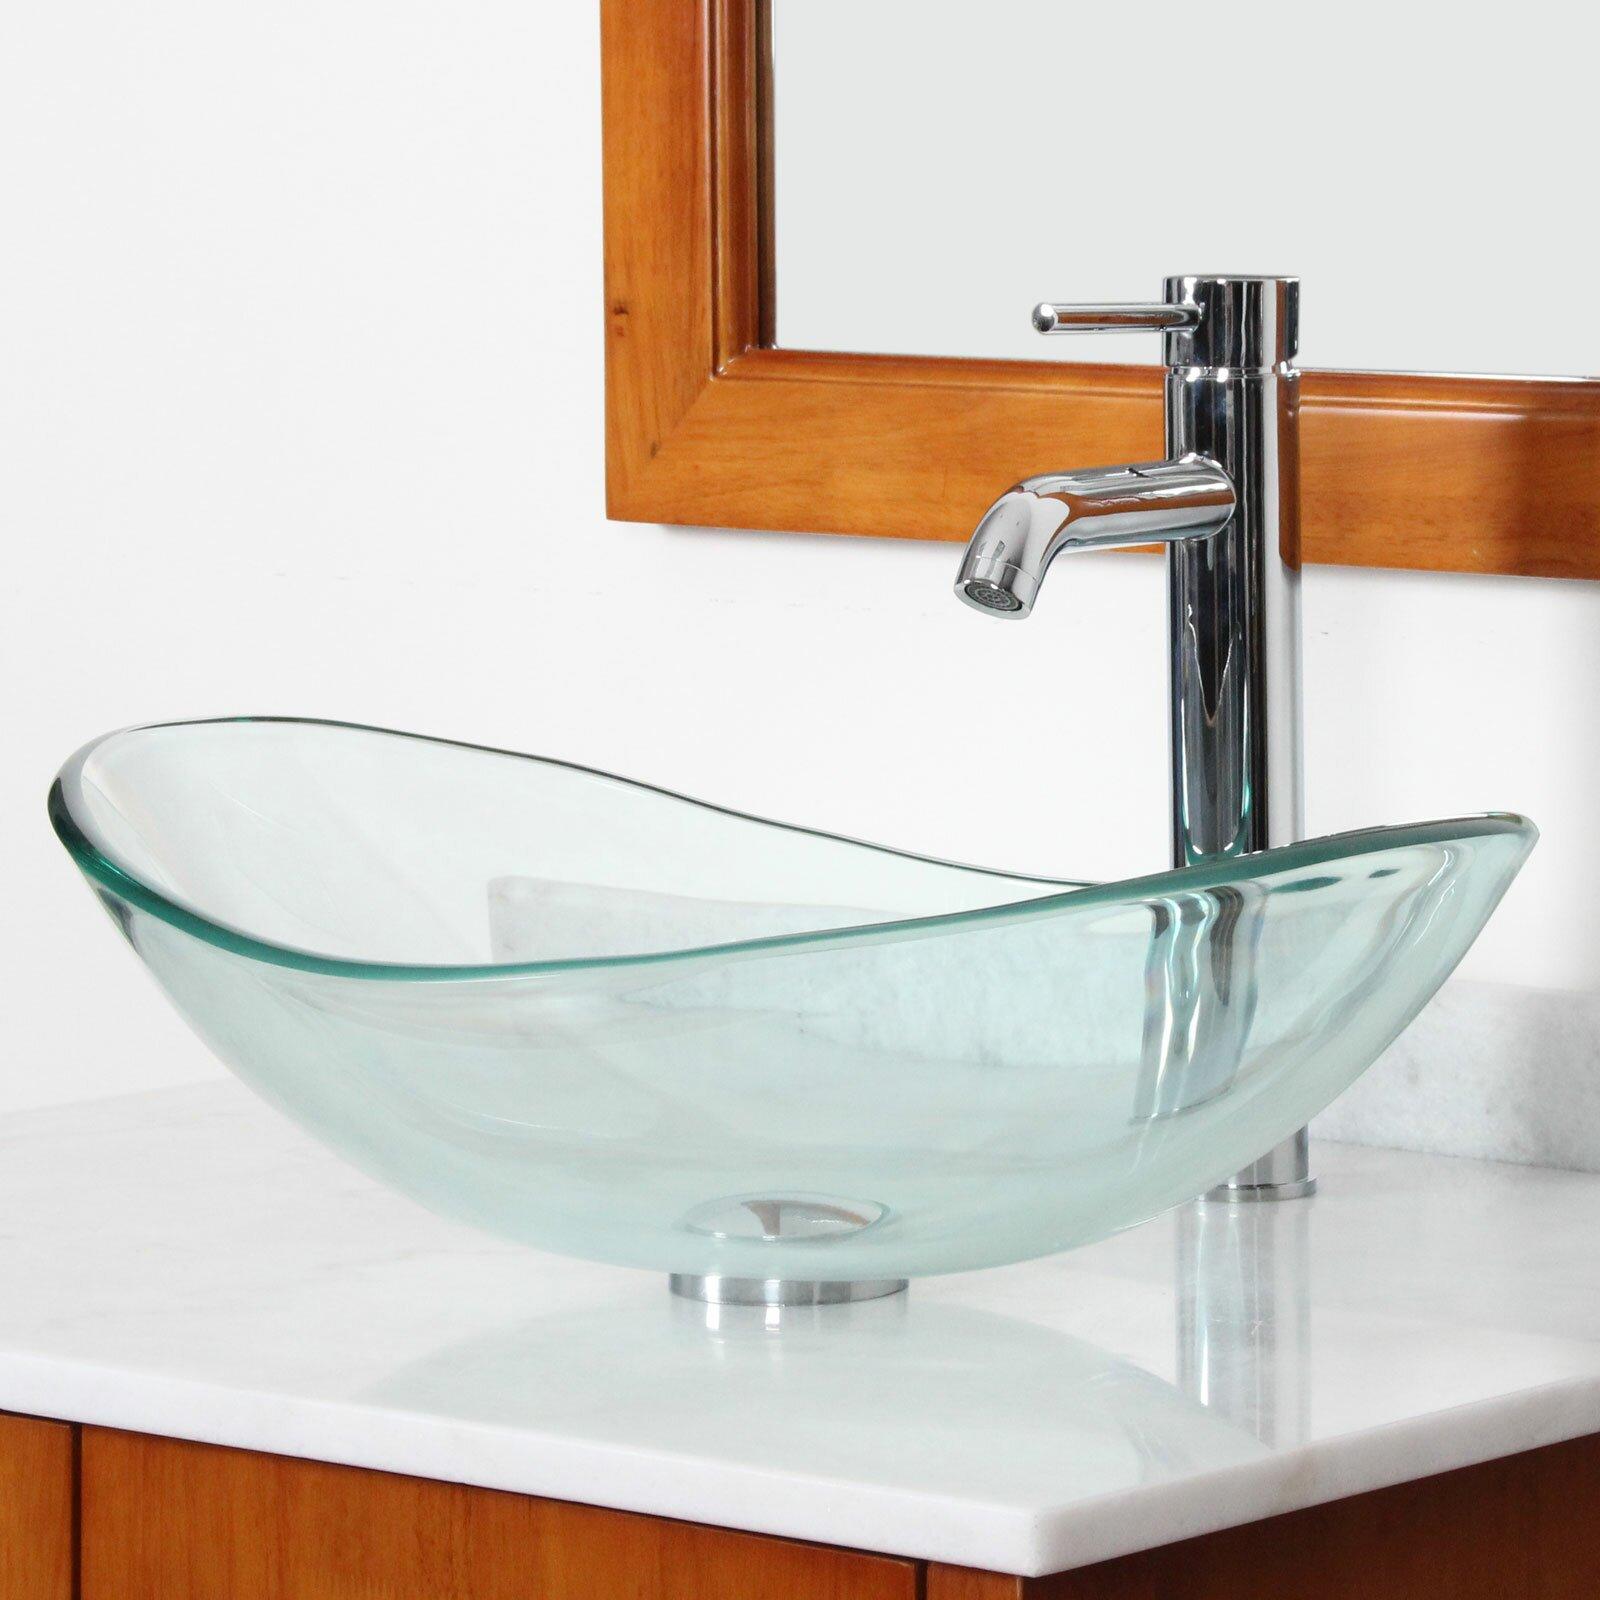 Glass Bathroom Sink Bowls : Tempered Glass Boat Shaped Bowl Vessel Bathroom Sink Wayfair